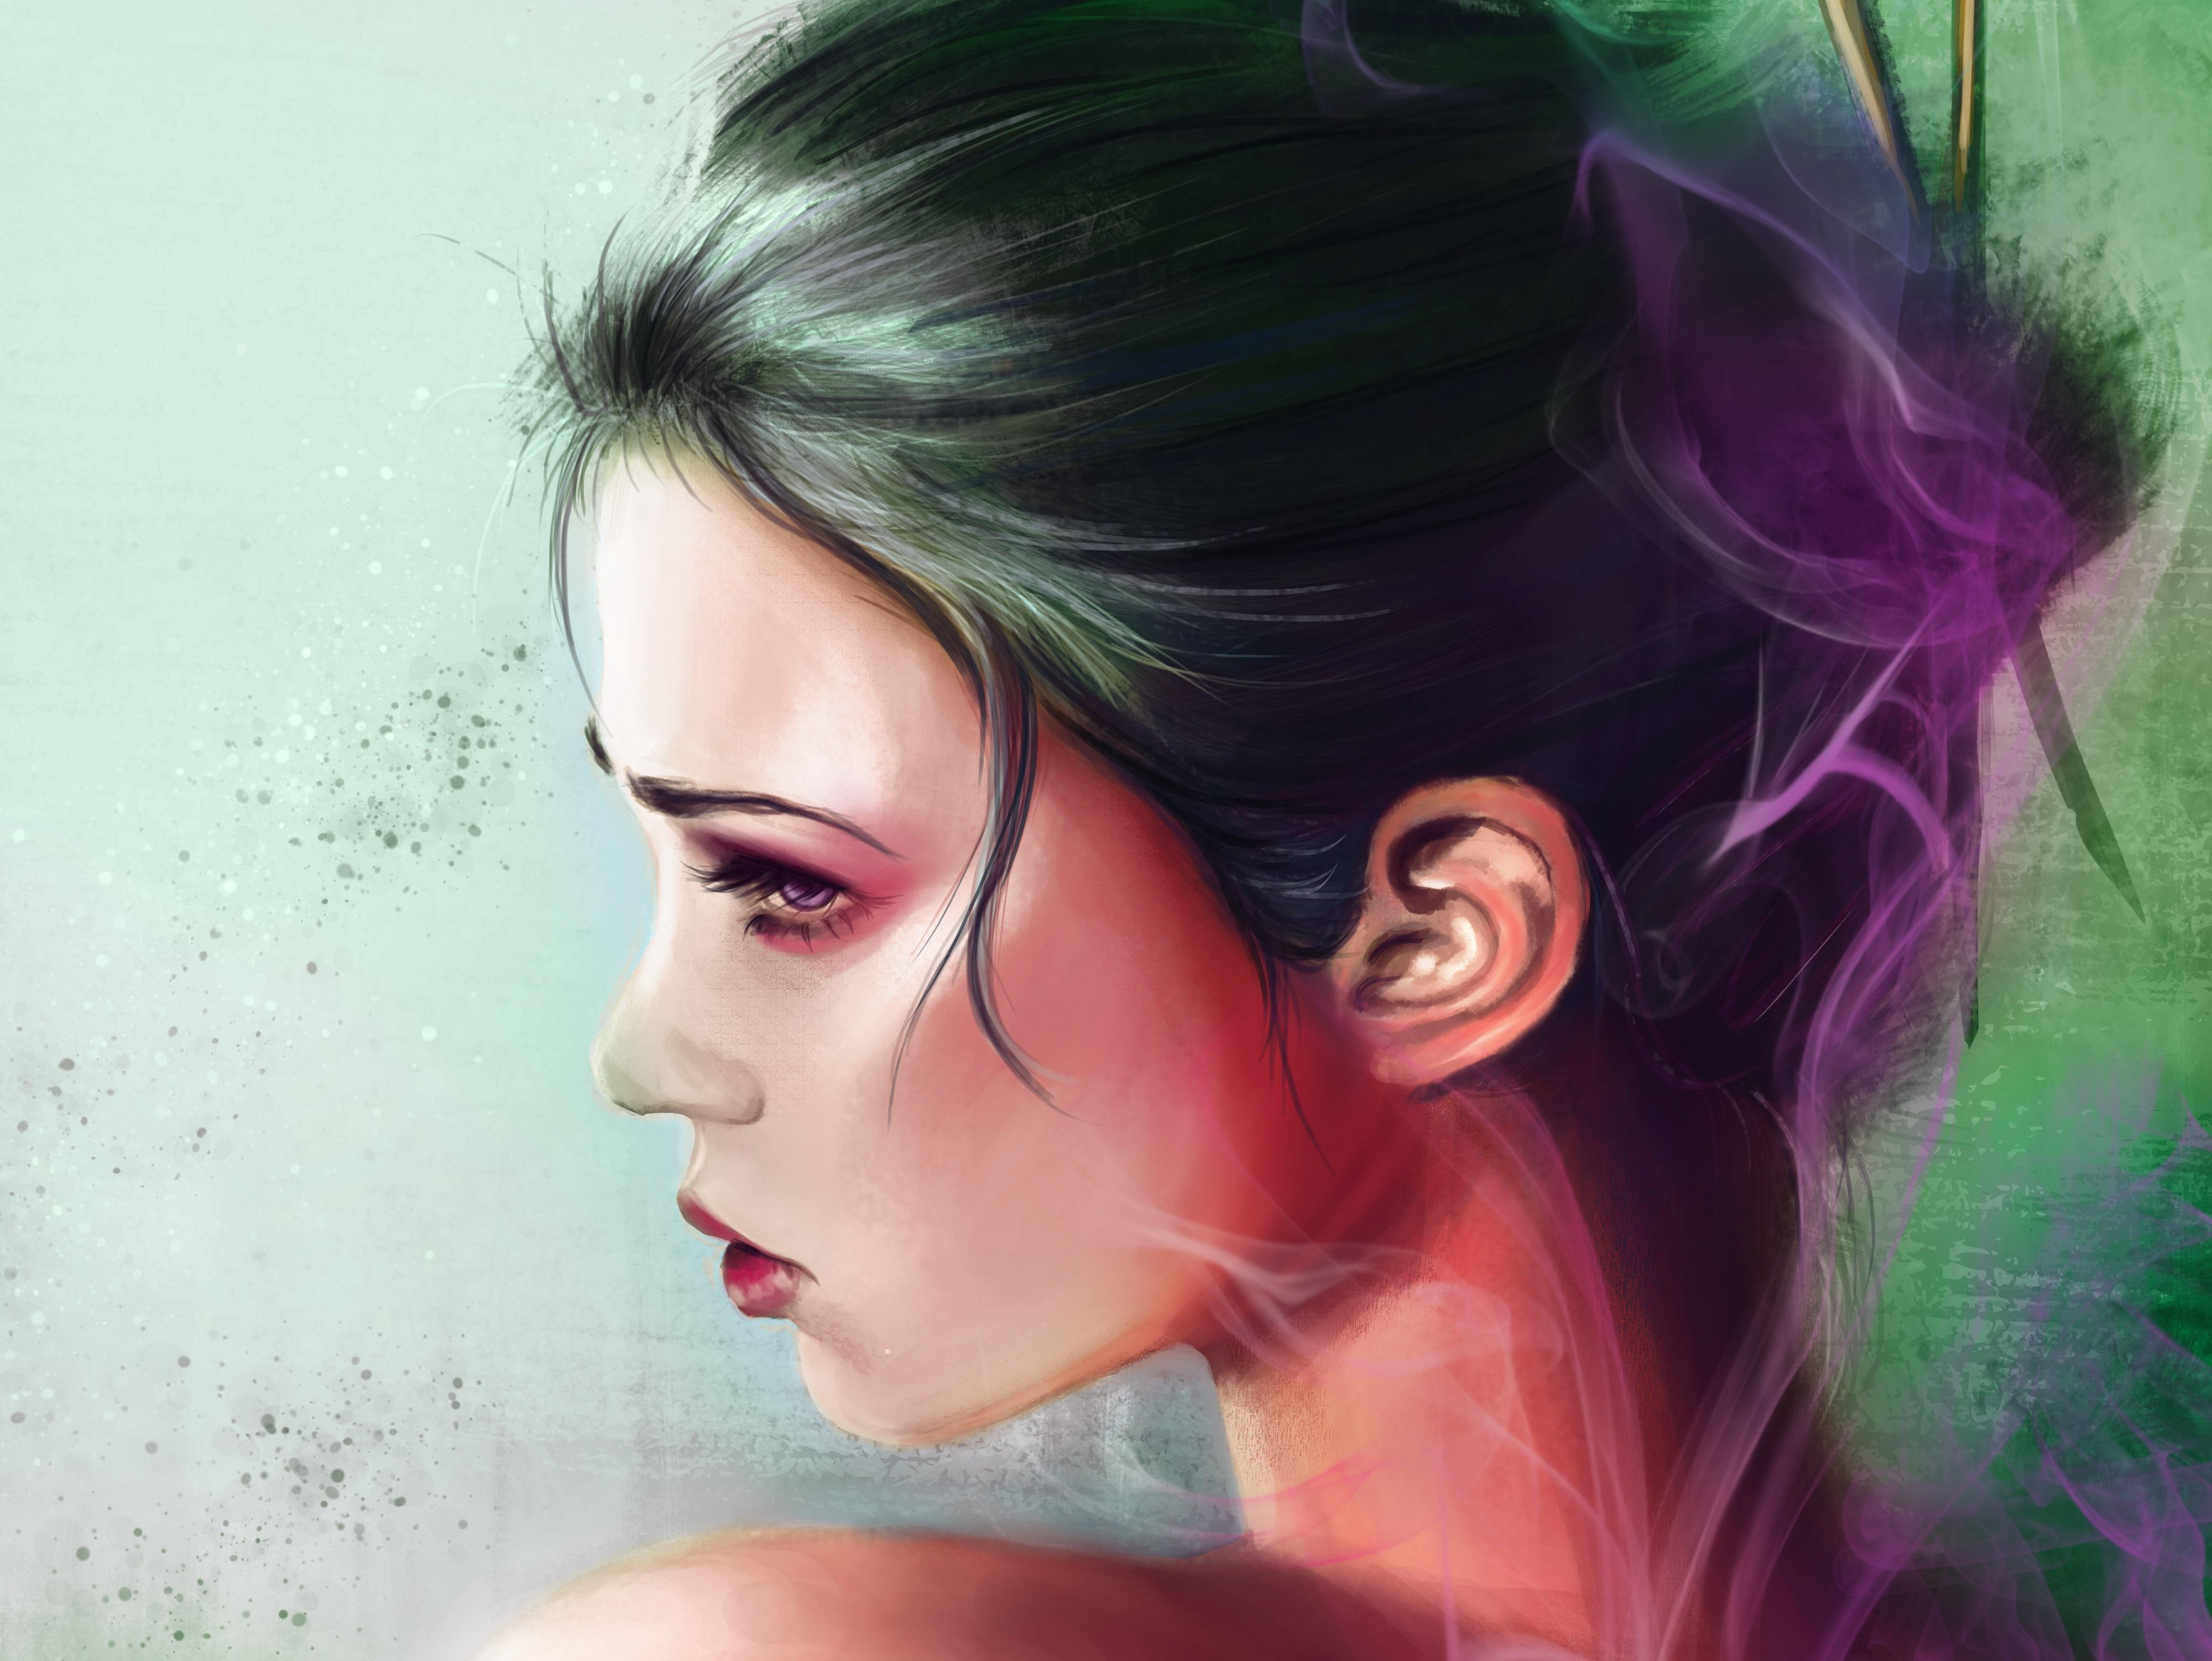 hair art wallpaper - photo #30